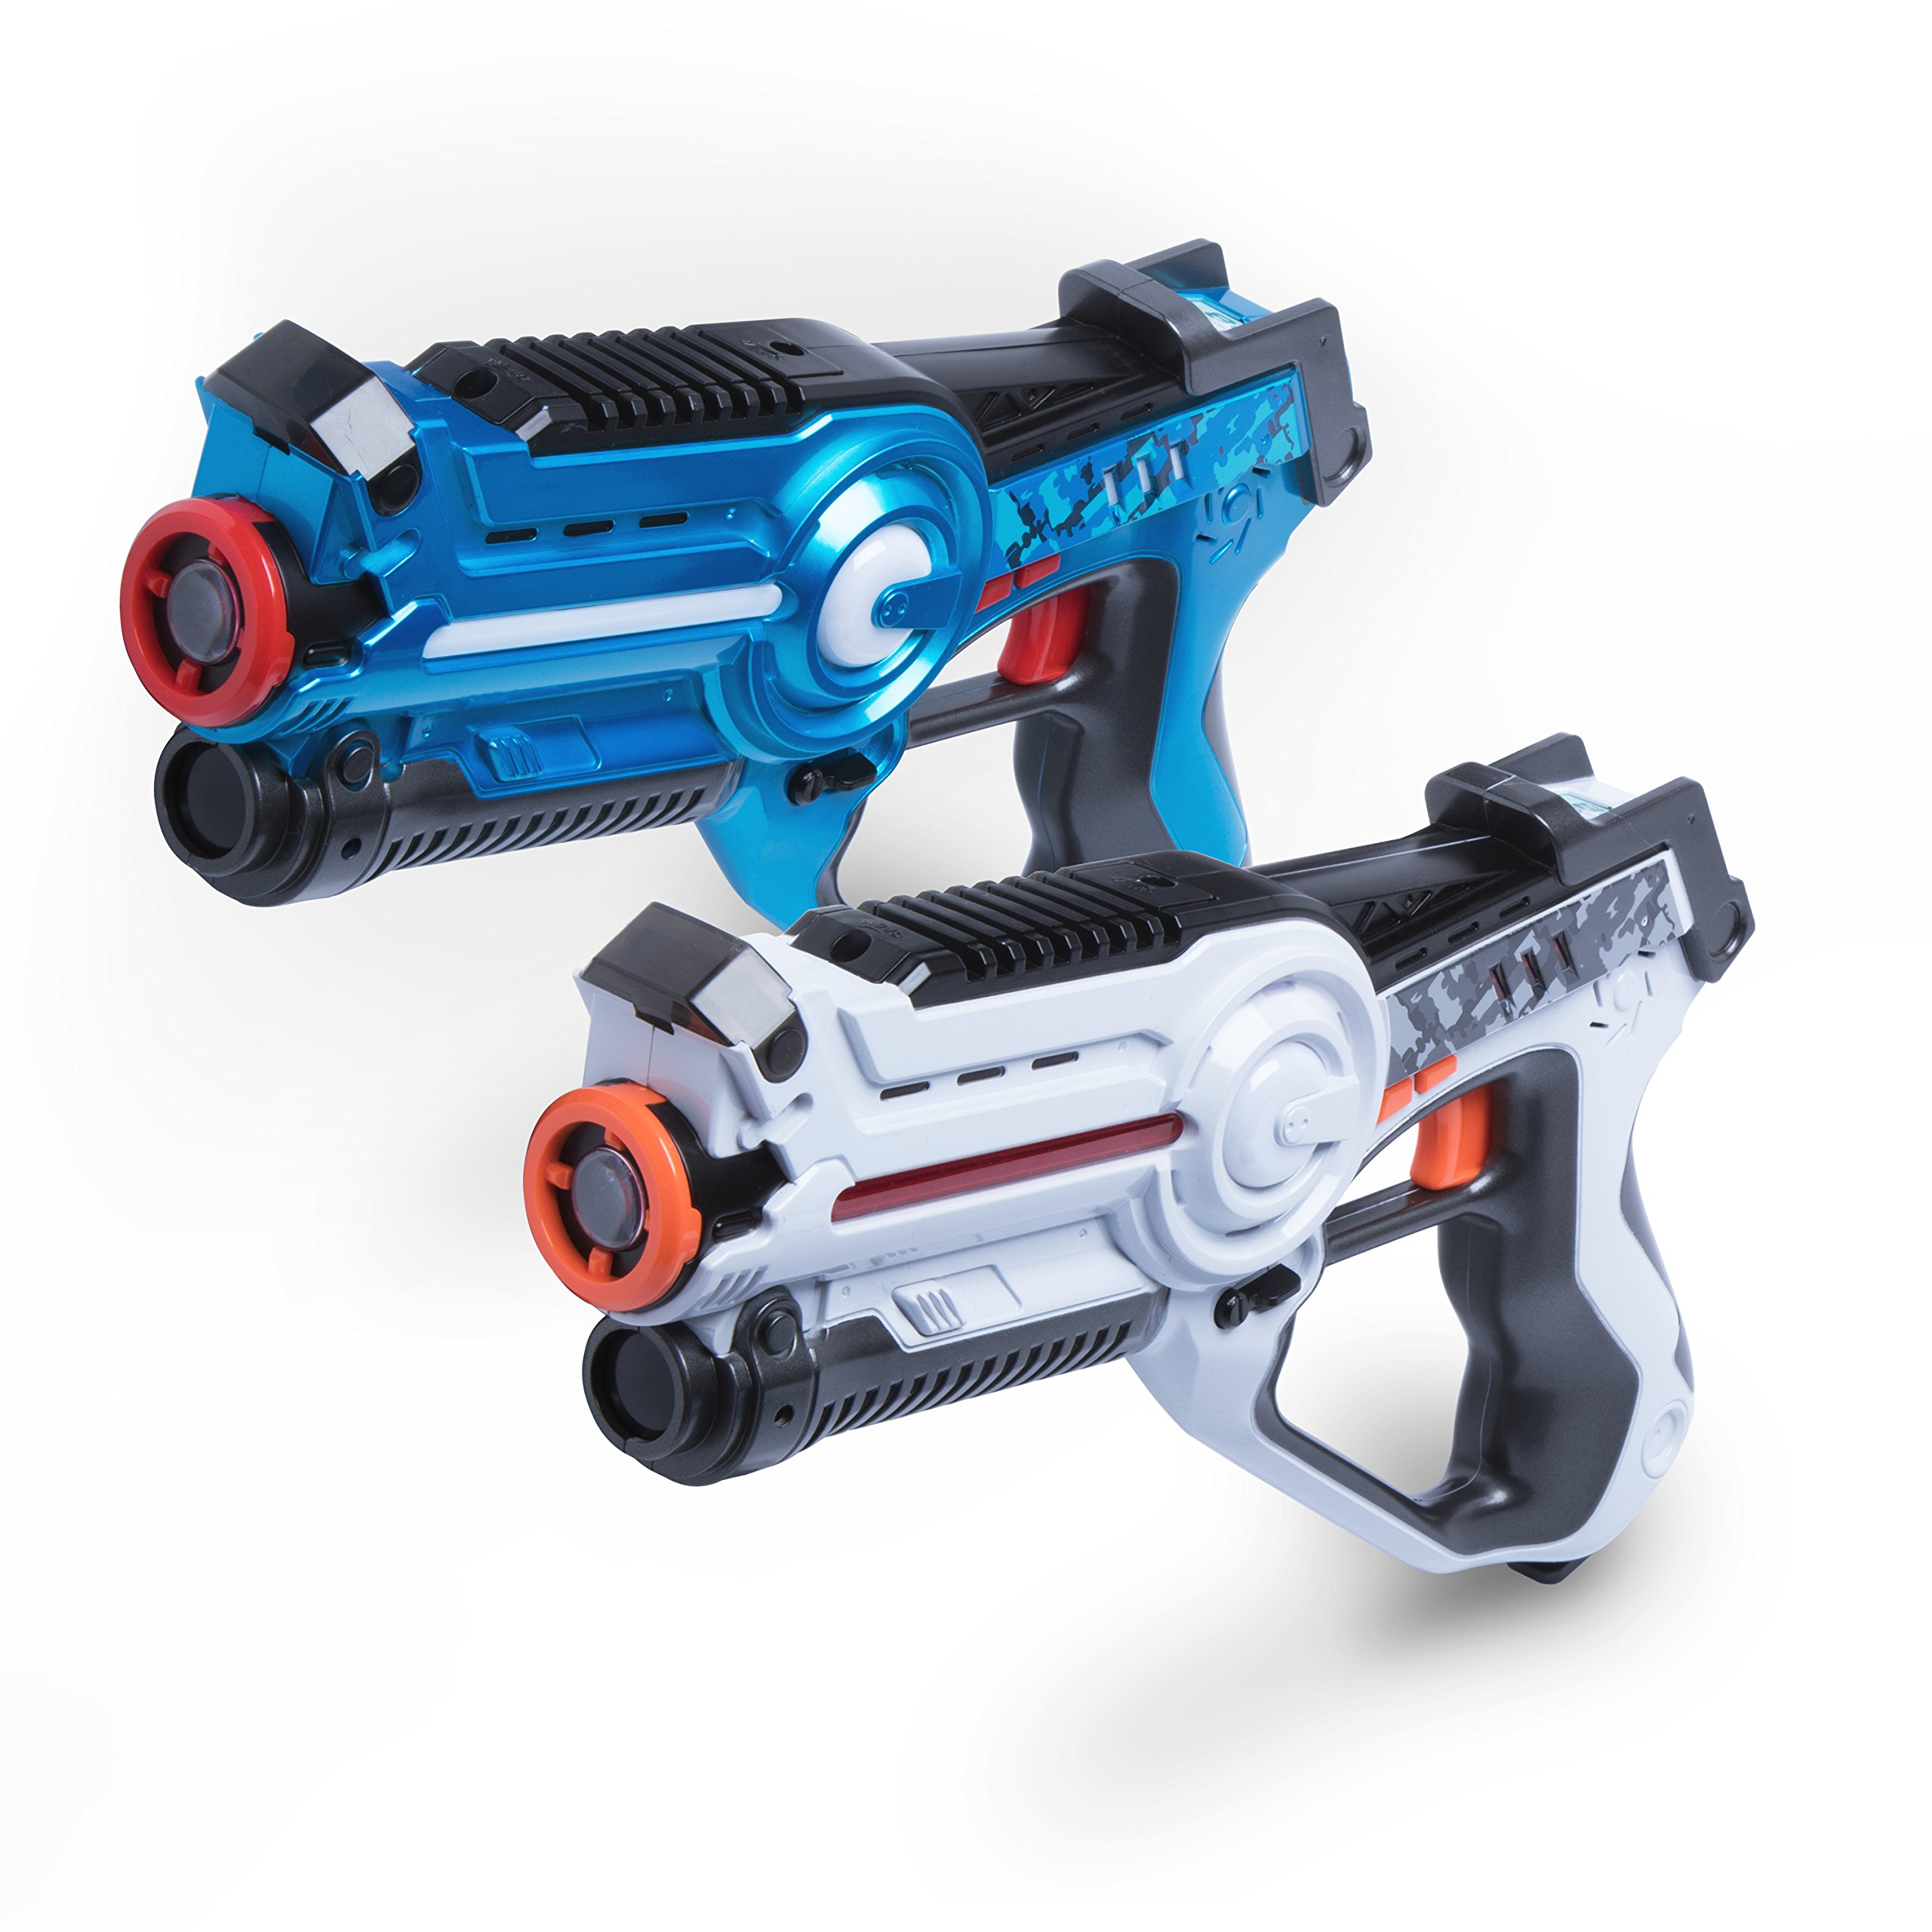 Cheap Laser Tag Guns For Kids, find Laser Tag Guns For Kids